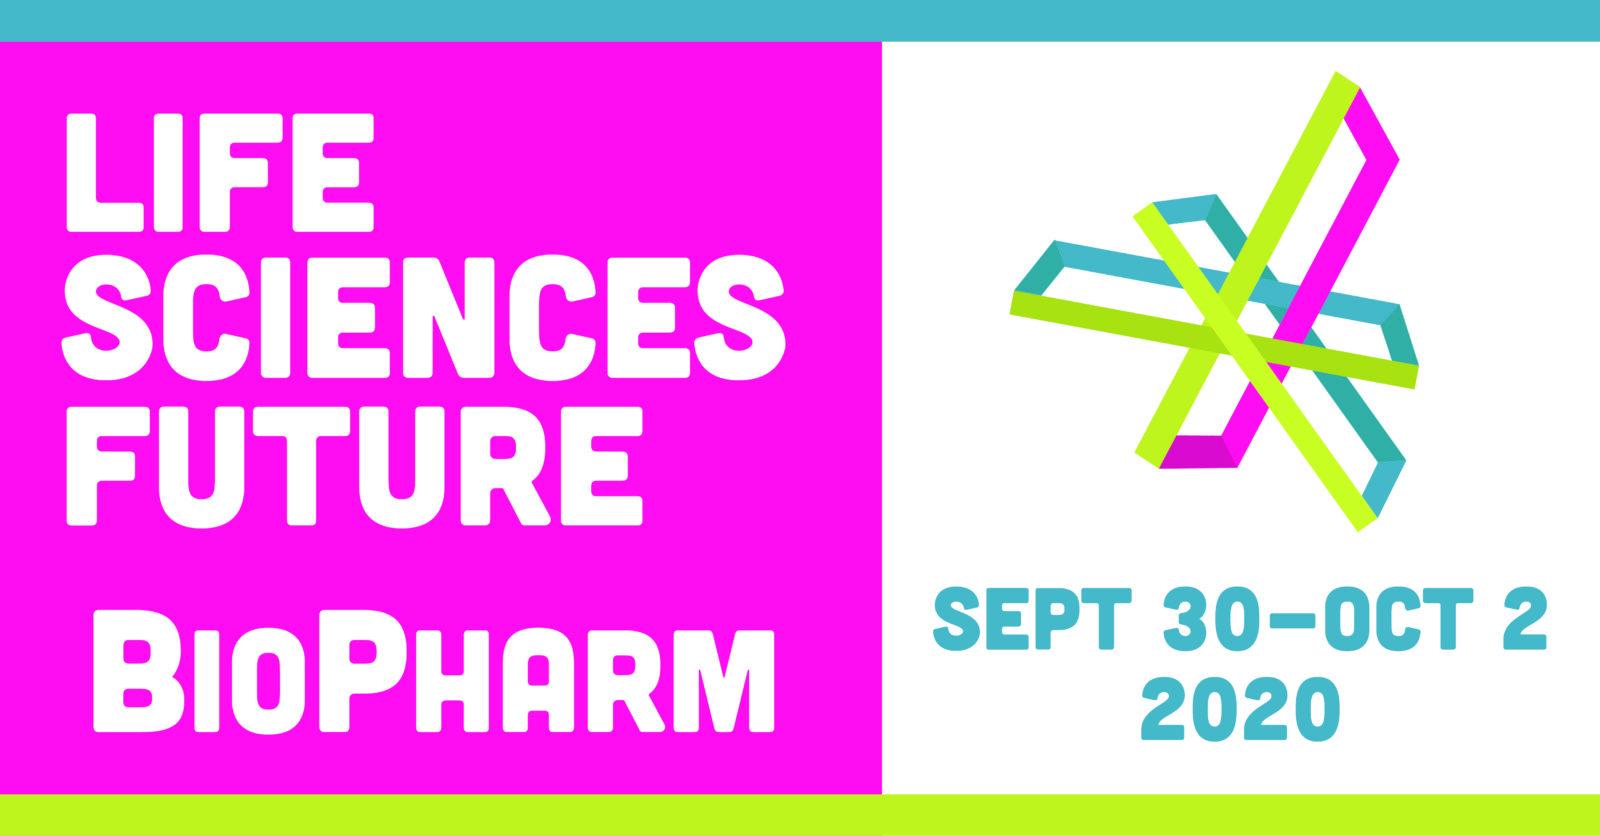 Life Sciences Future BioPharma